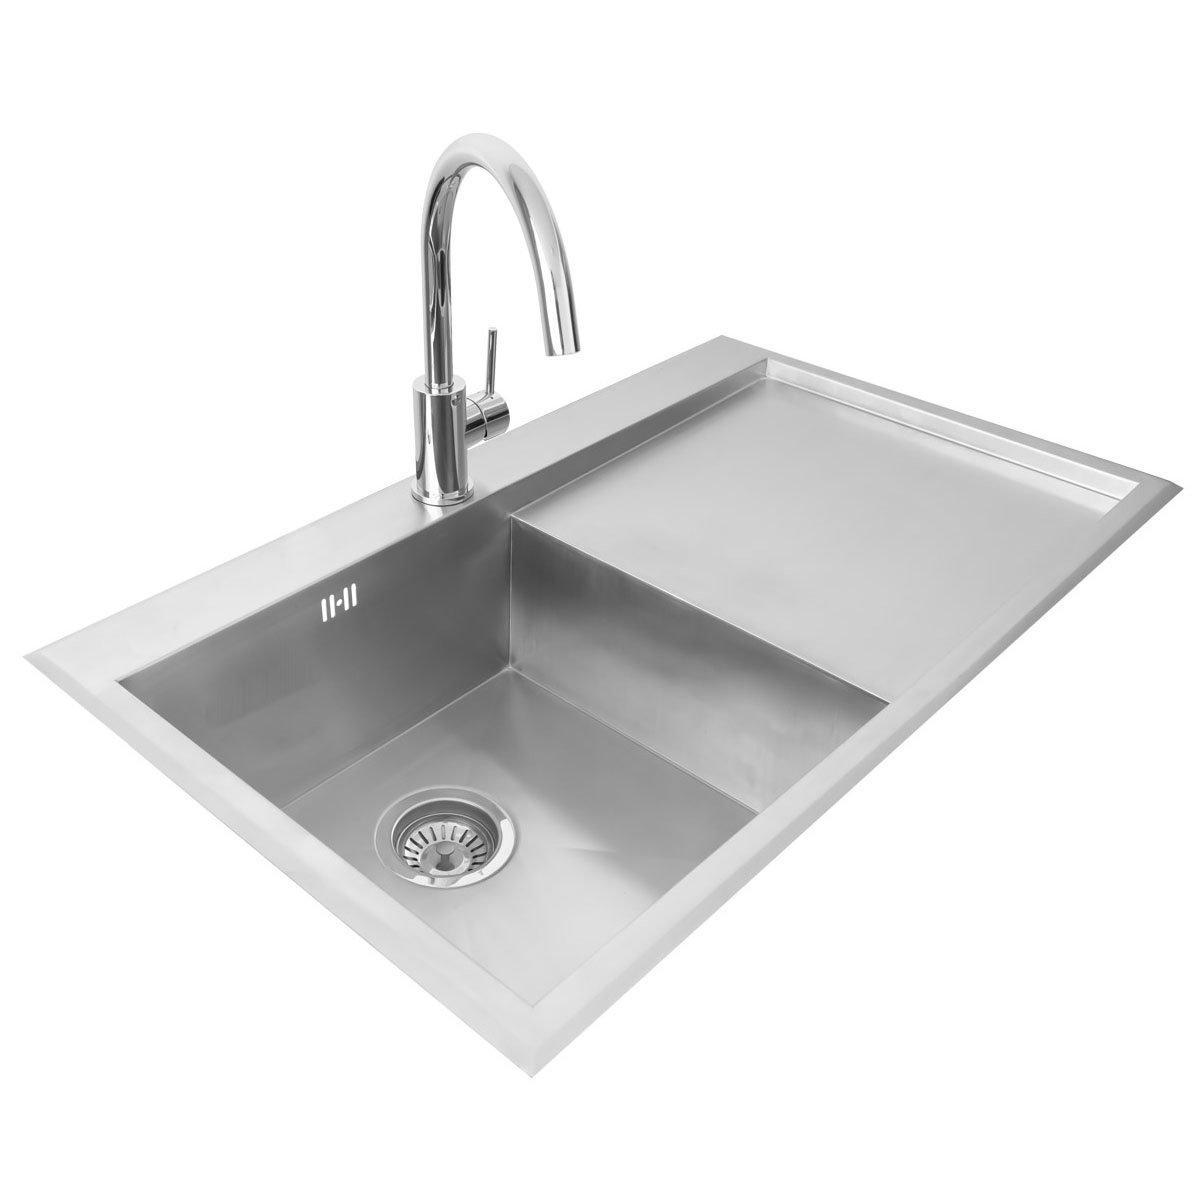 compact kitchen sink workbench valle richmond 860x510mm right hand single bowl